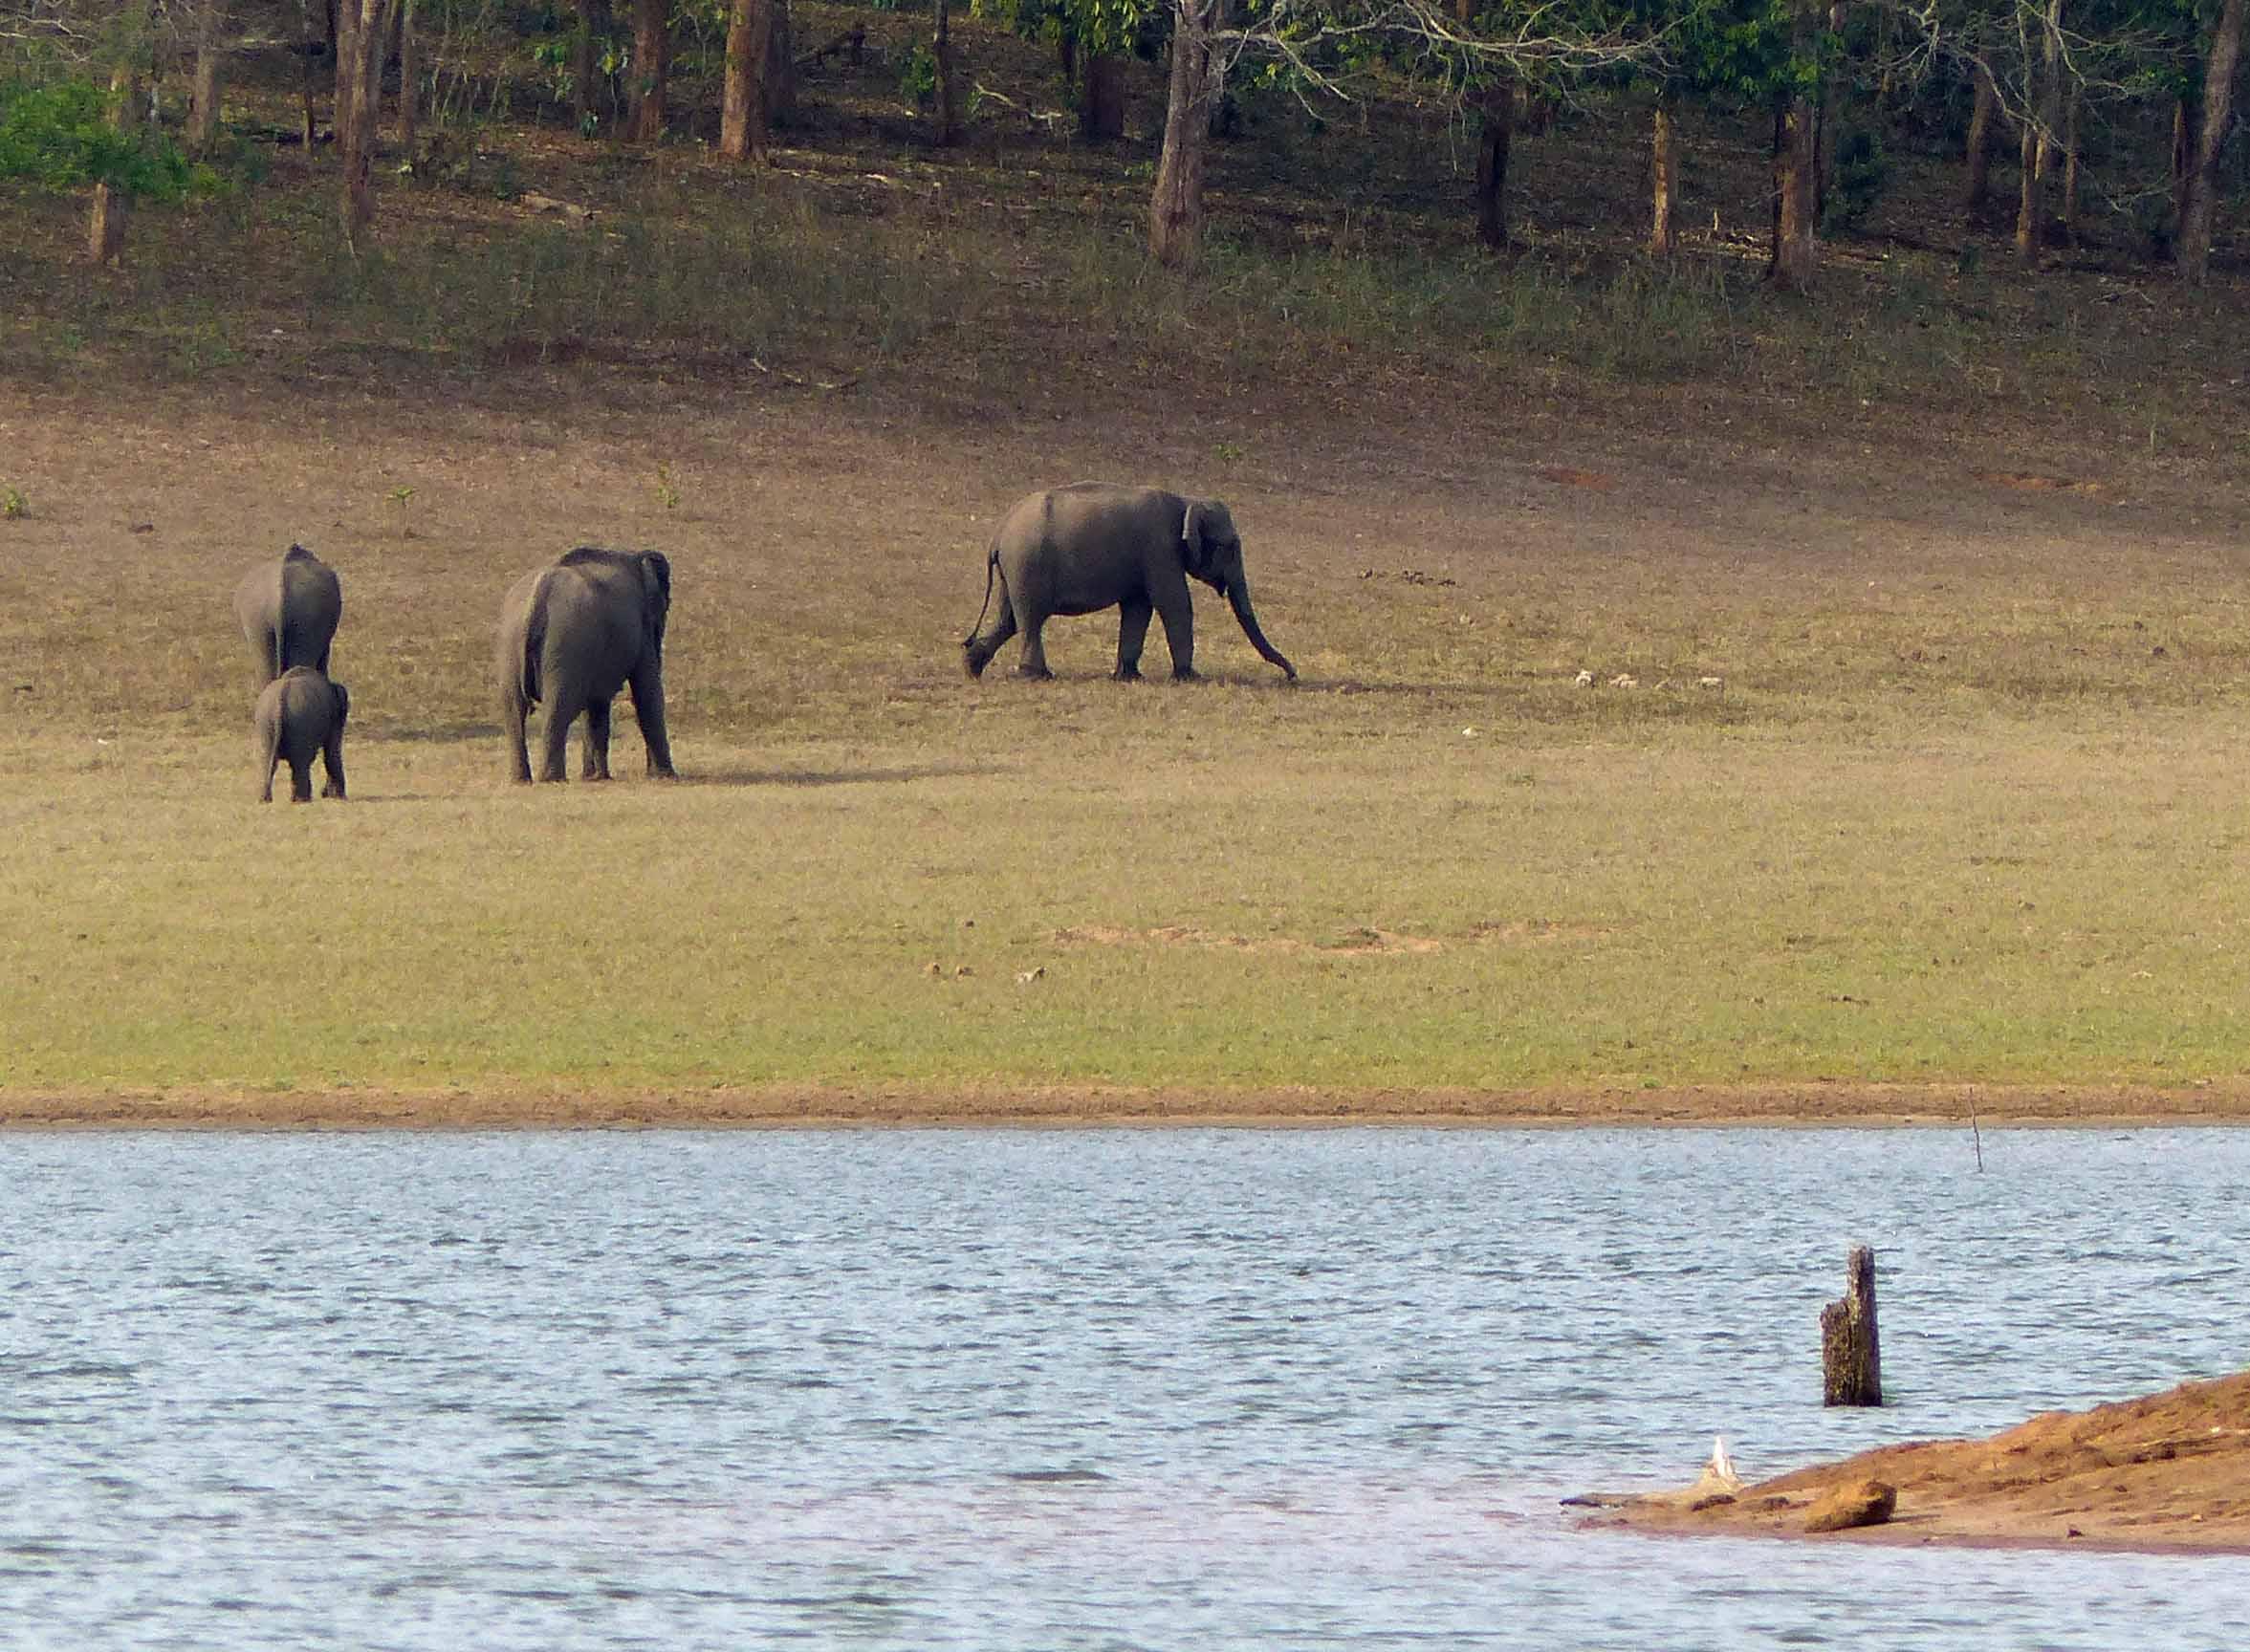 Three female elephants and a calf by a lake